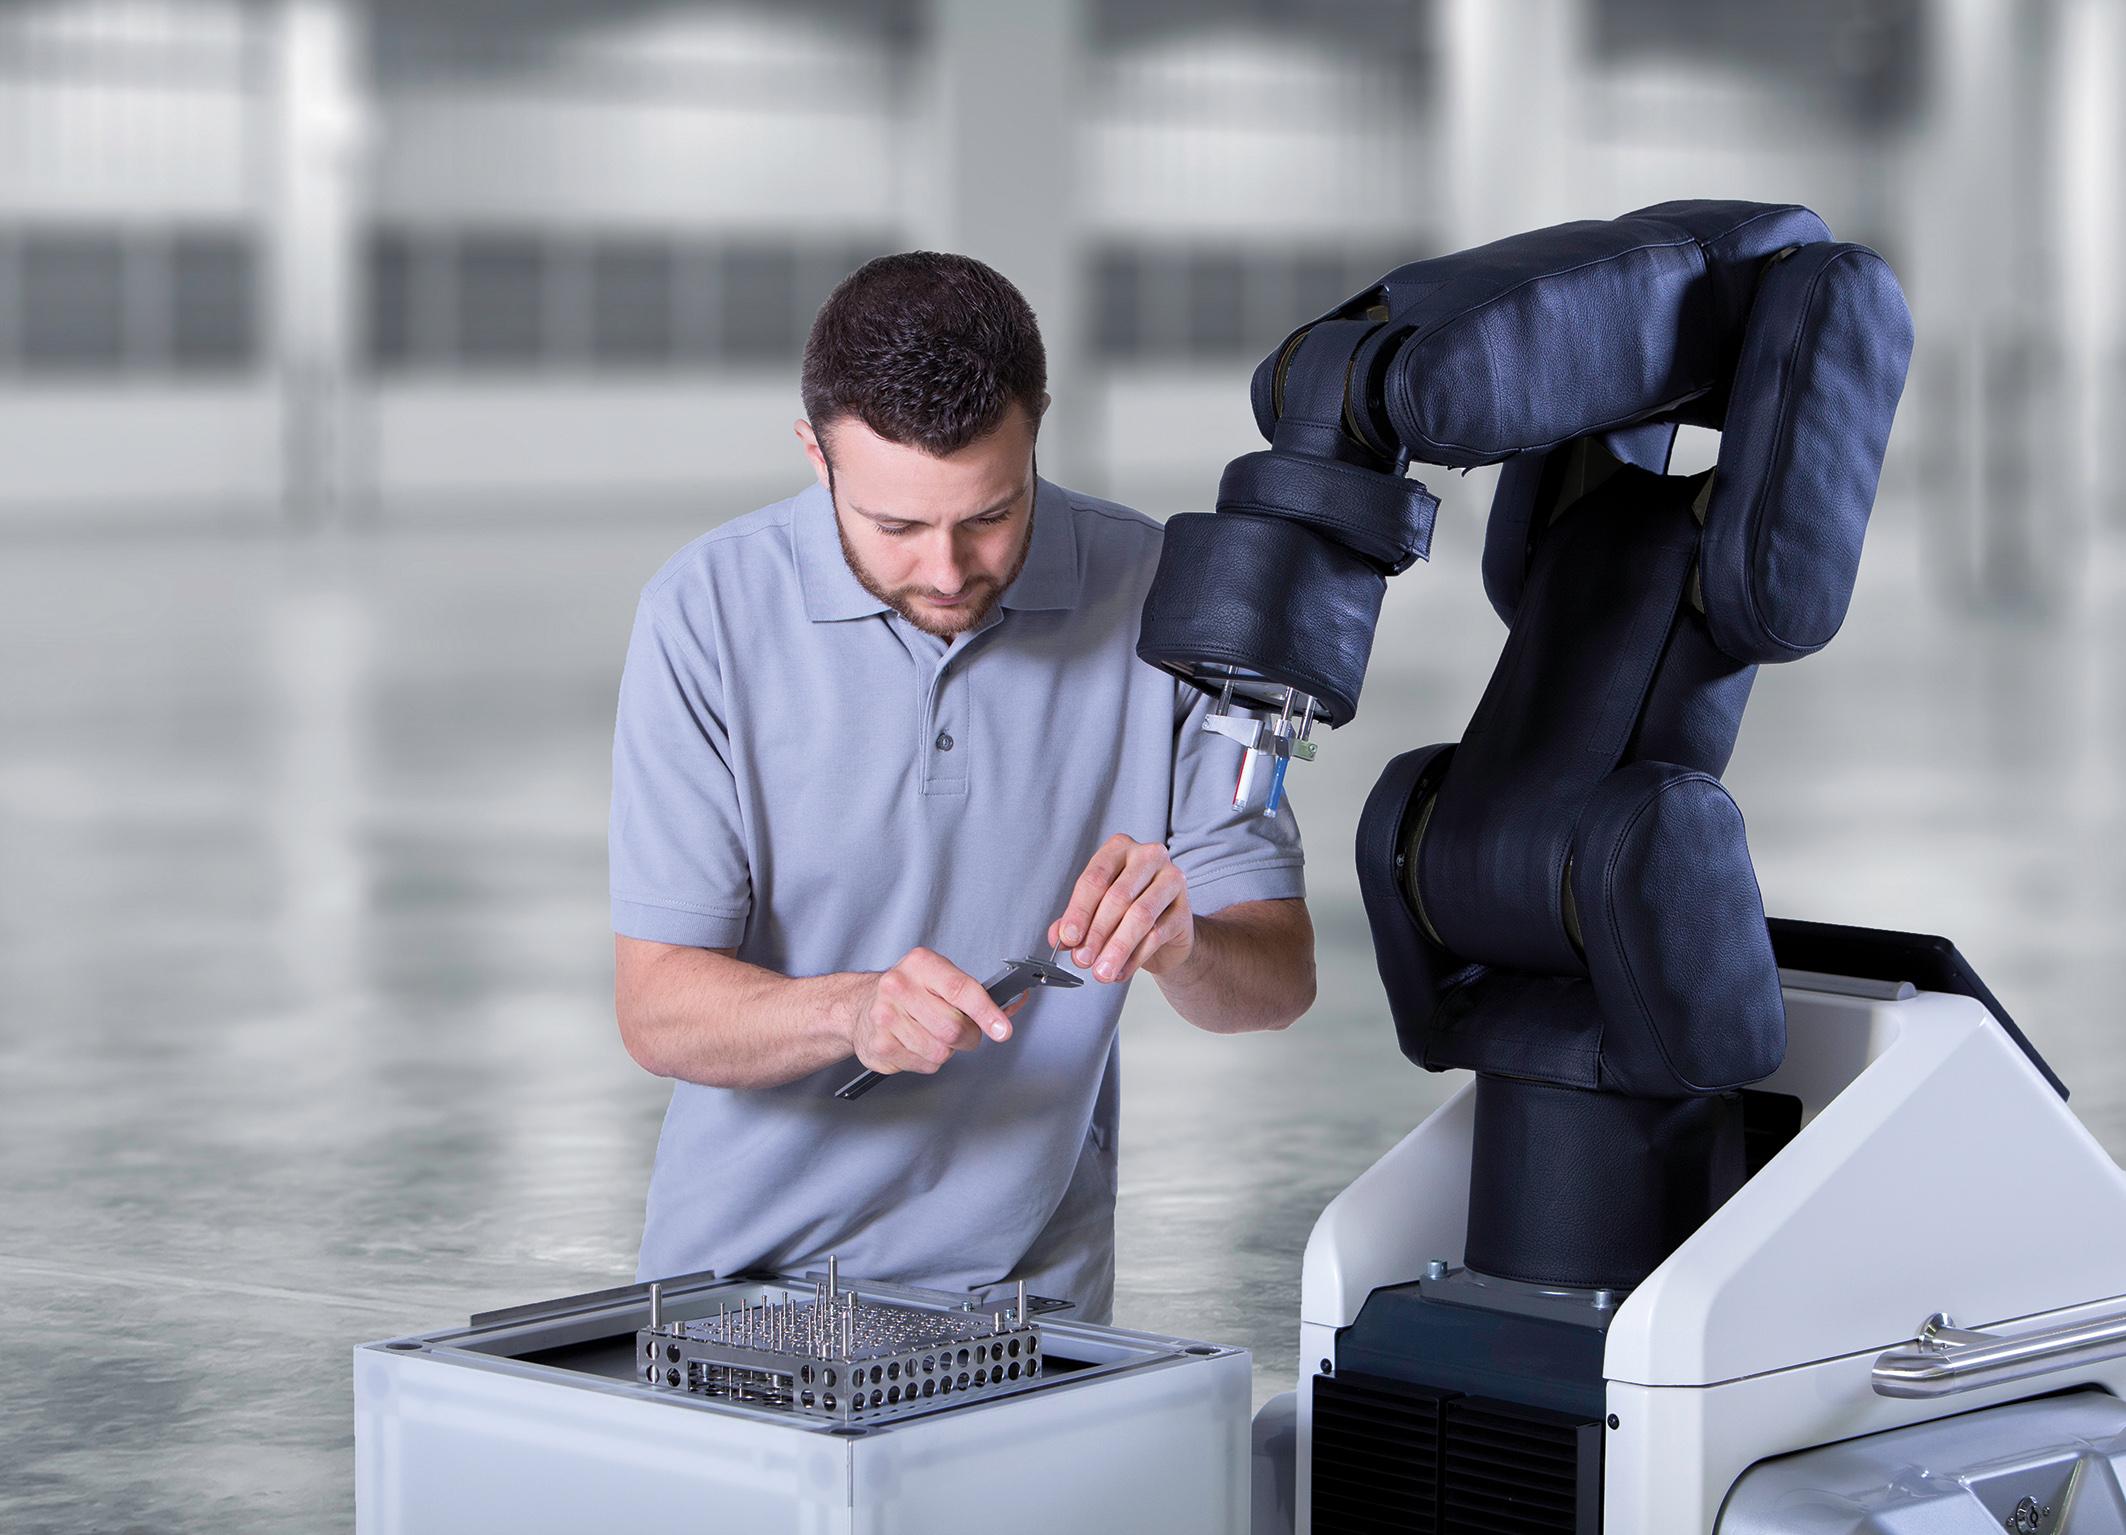 APAS assistant  Mobiler Produktionsassistent